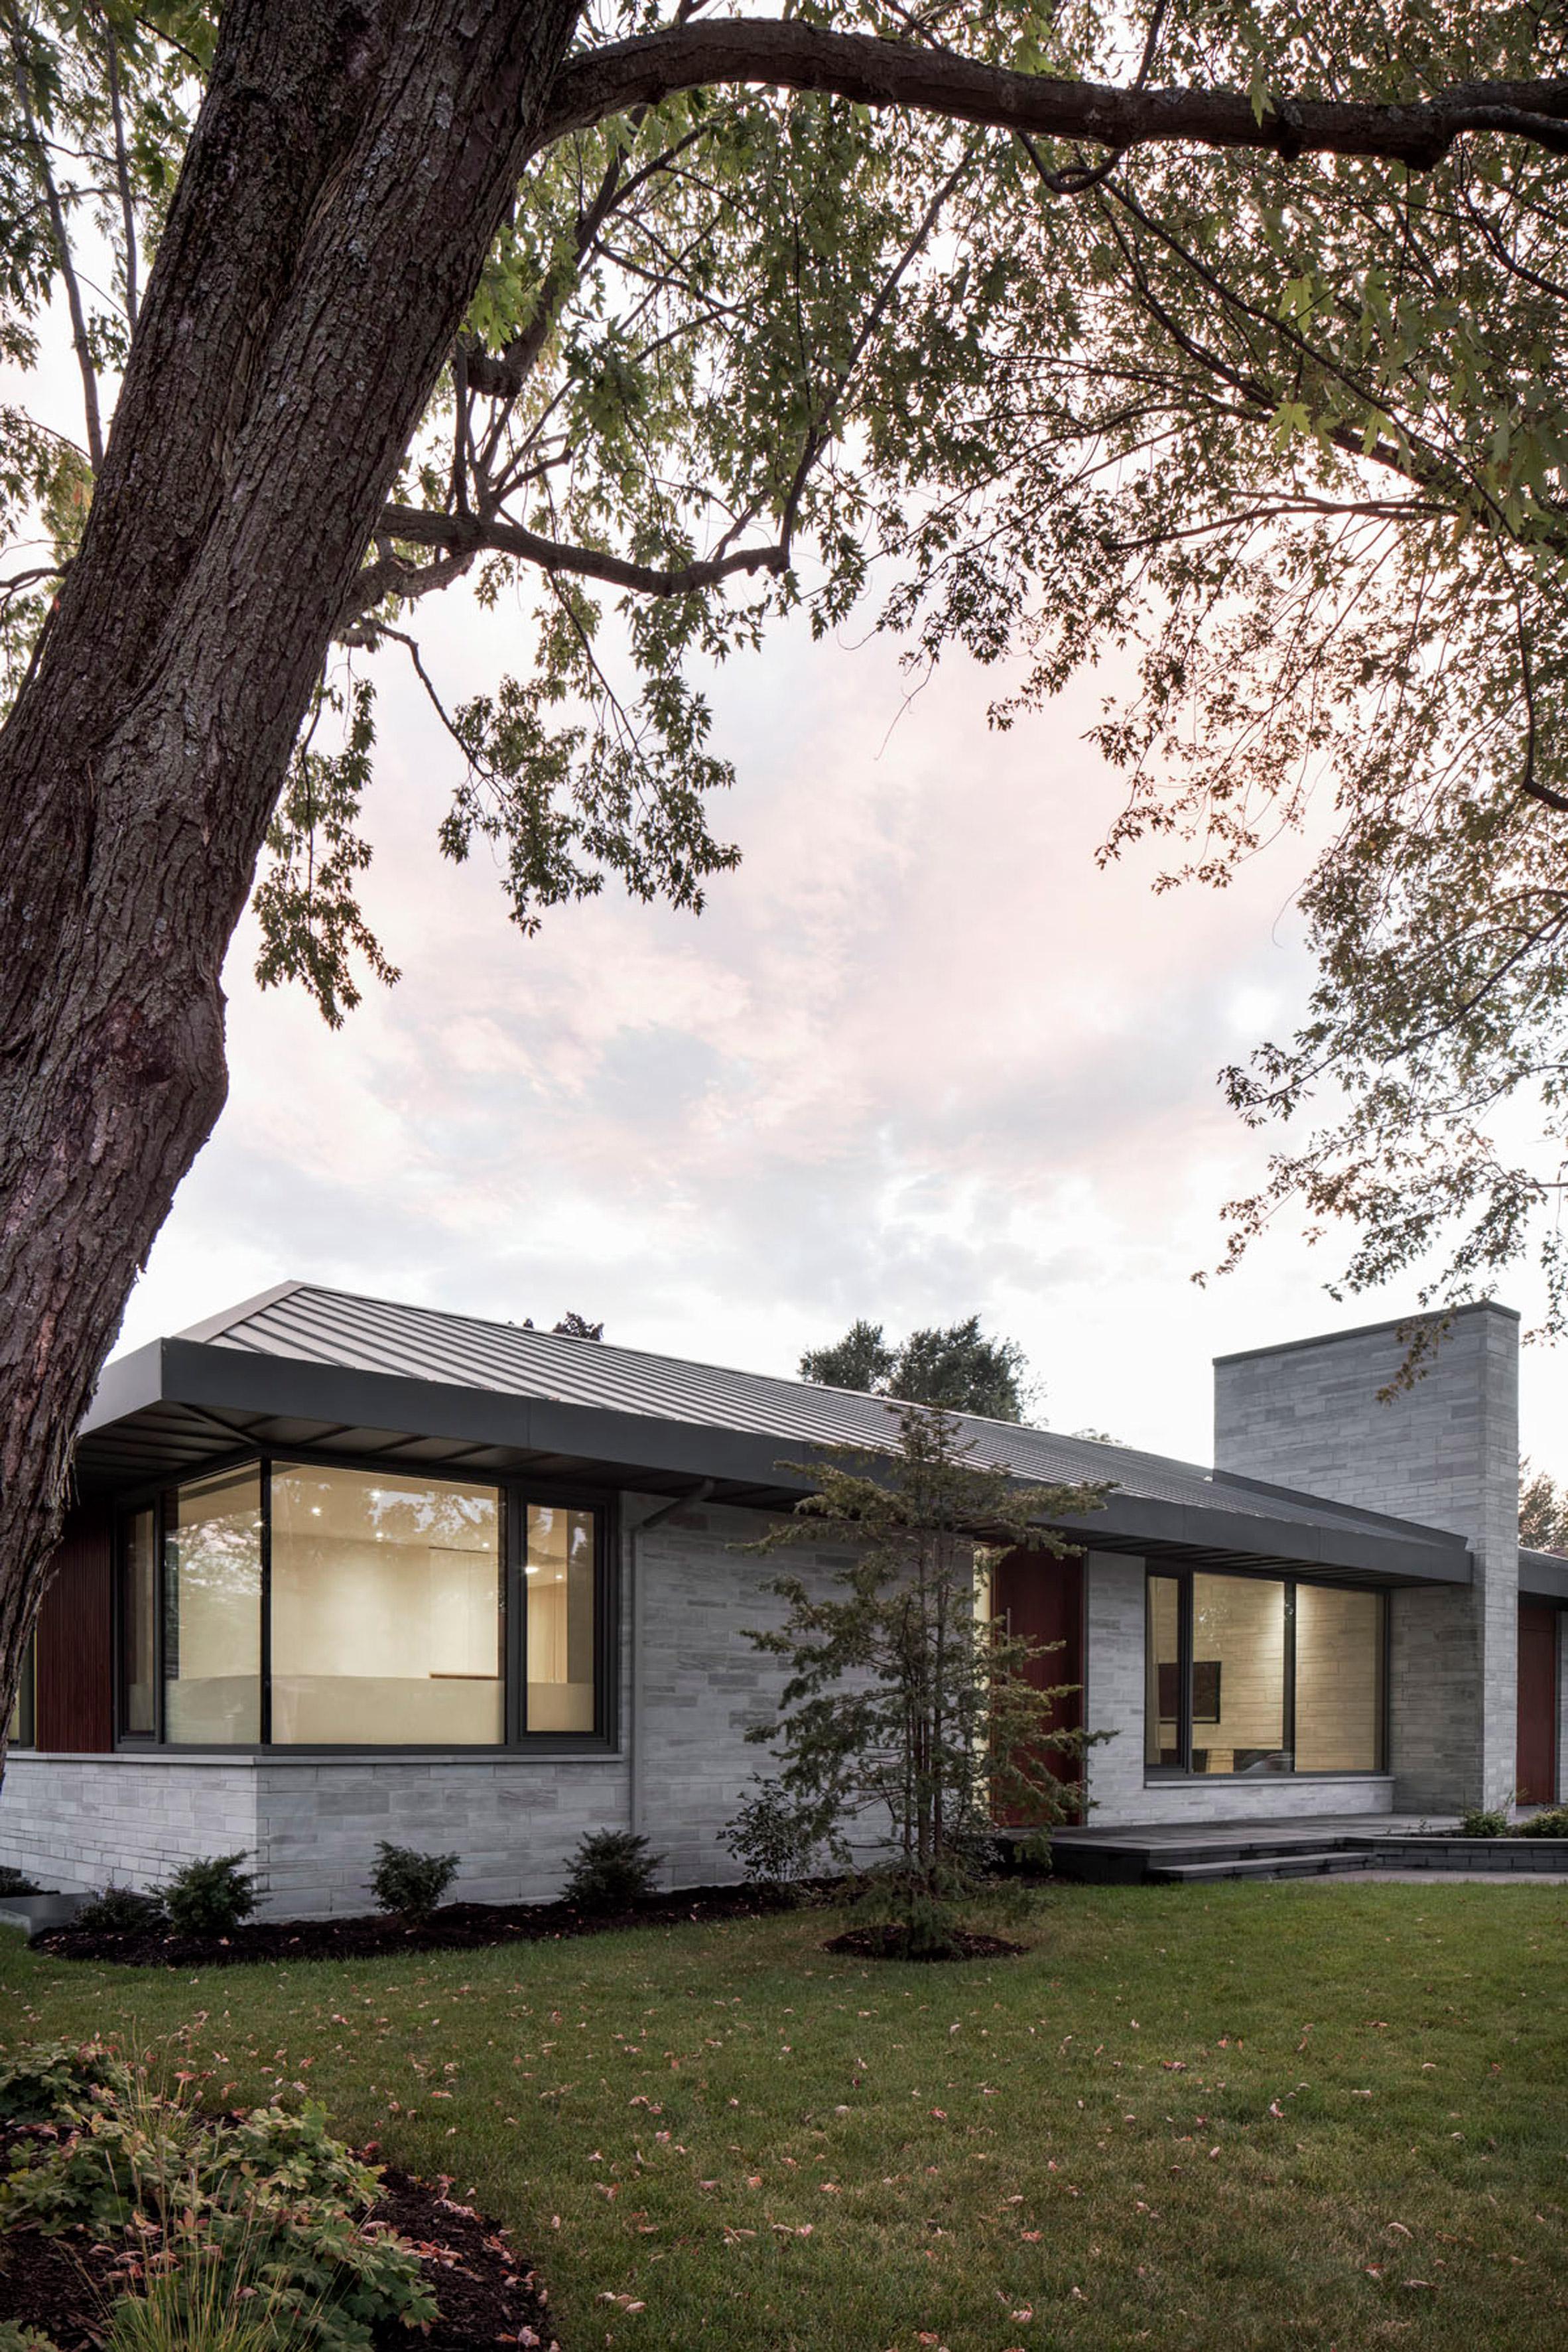 Naturehumaine updates mid-century Prairie House with minimalist interiors